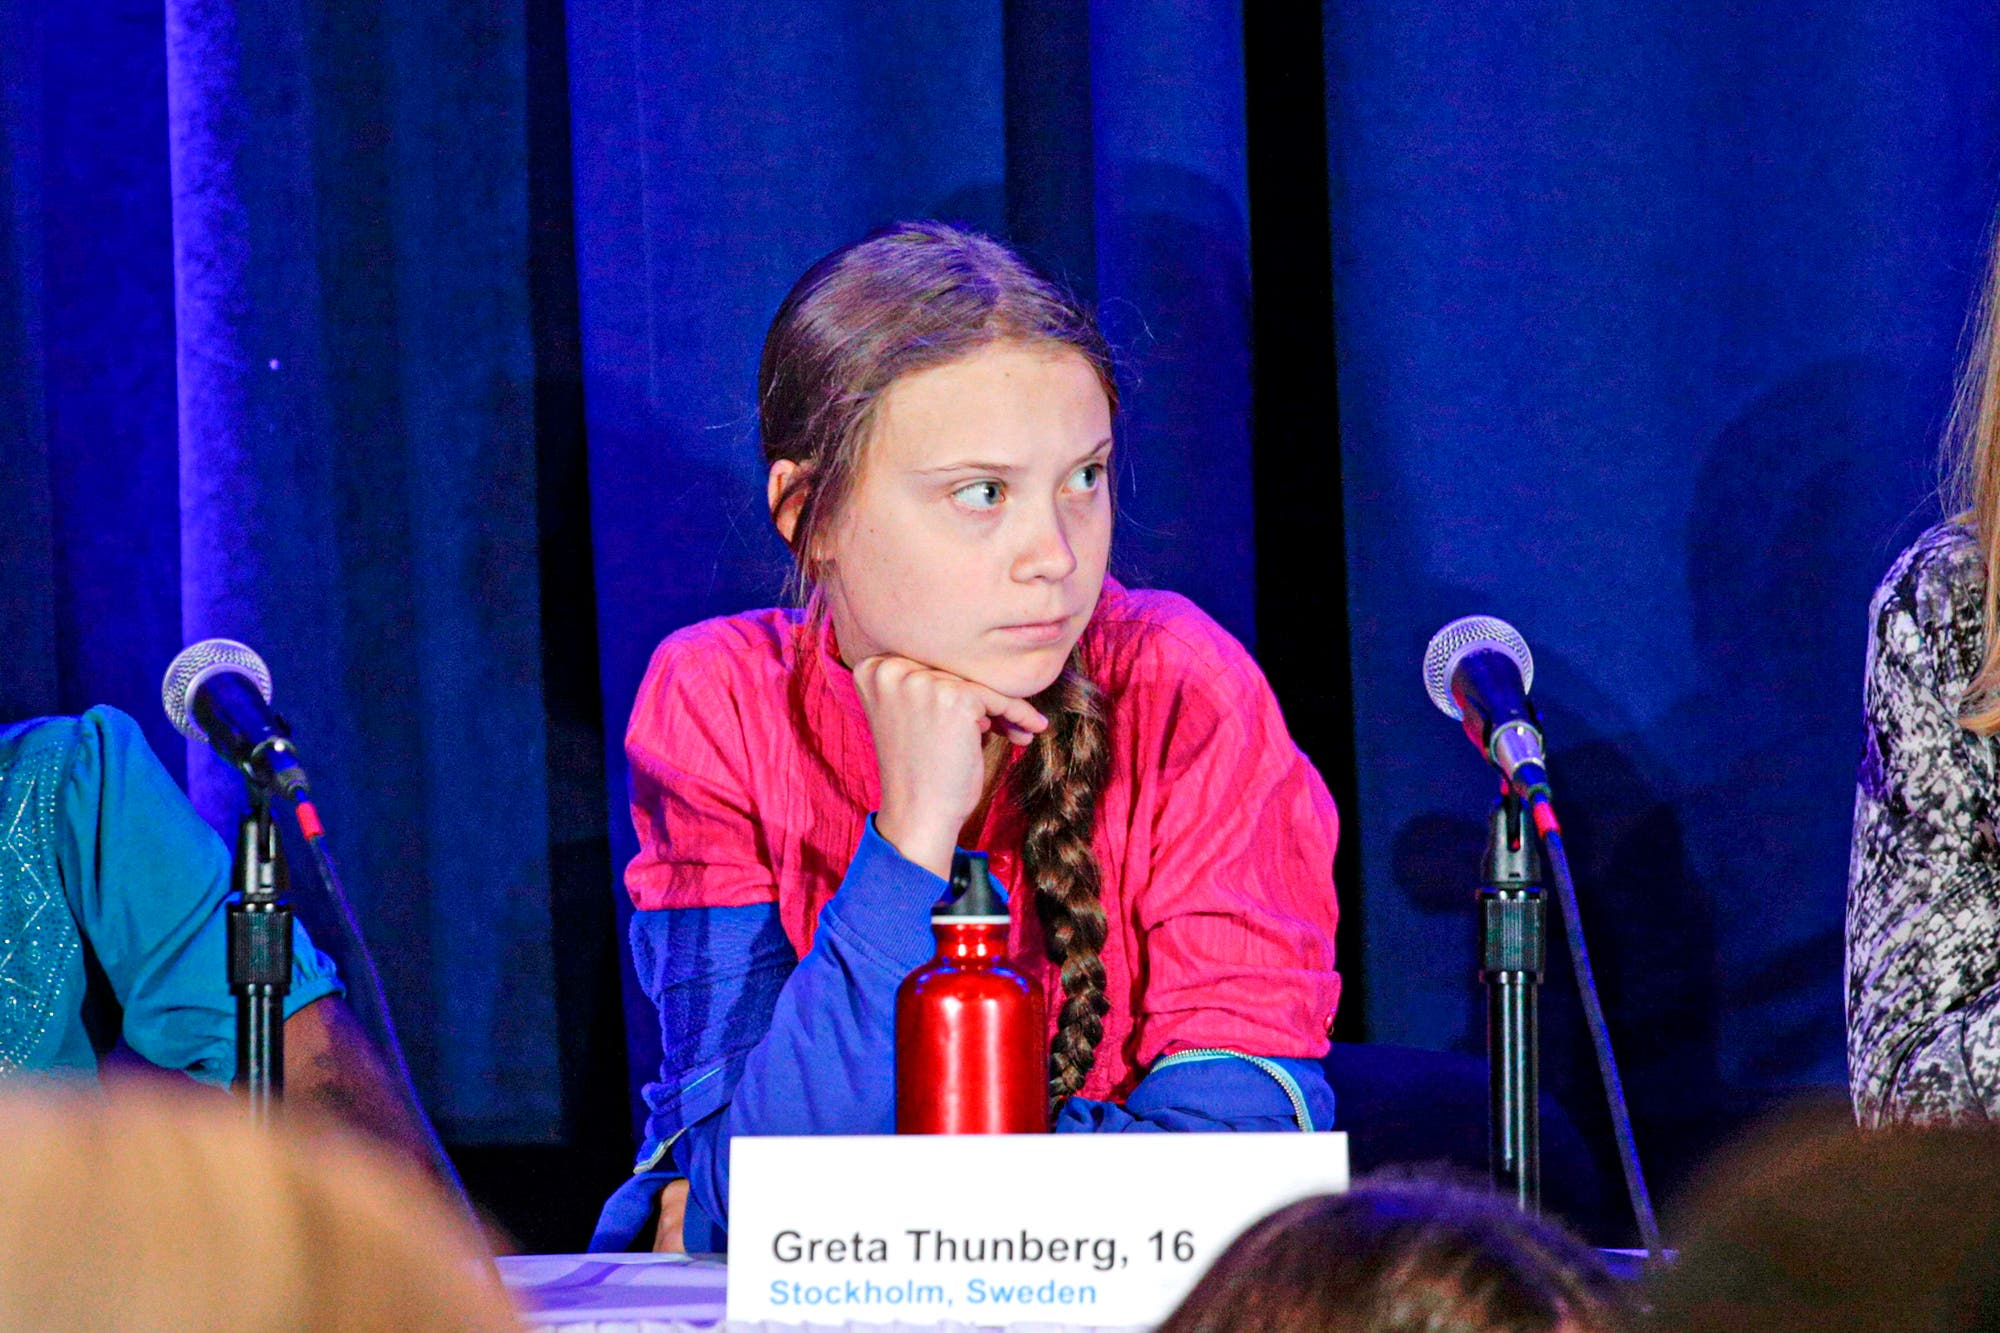 La madre de Greta Thunberg es una famosa cantante europea